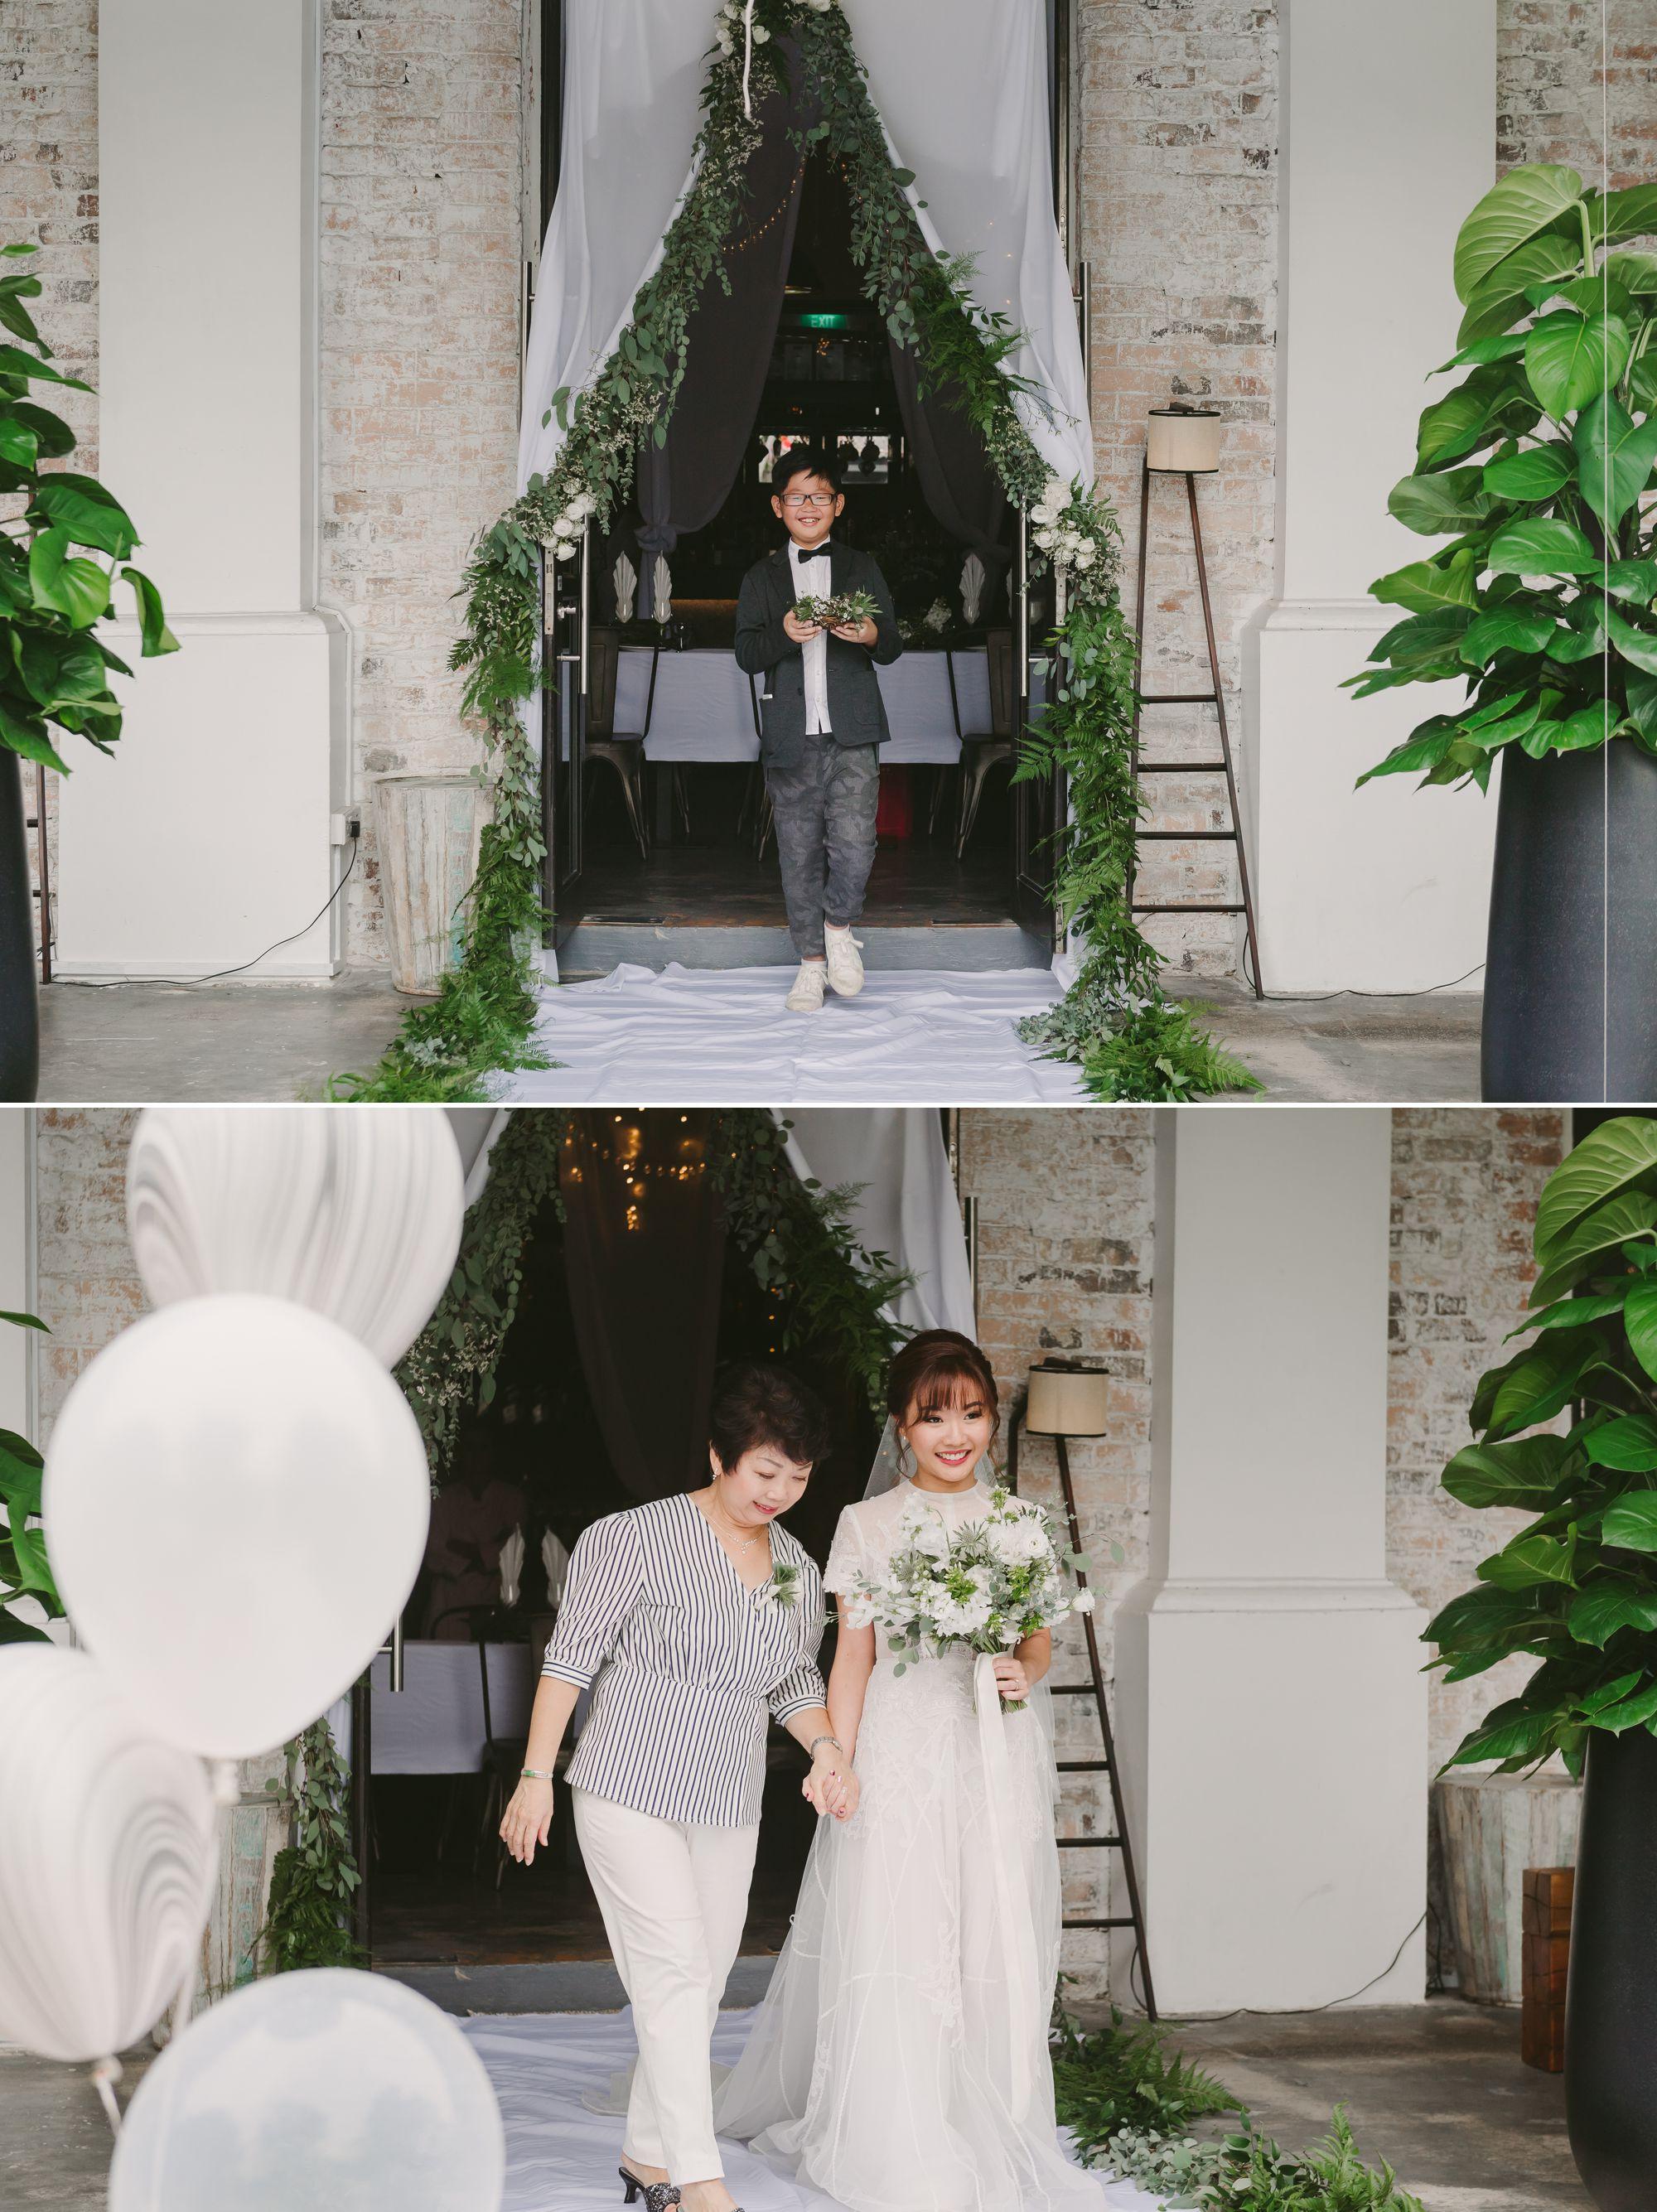 wedding_photography 14.jpg